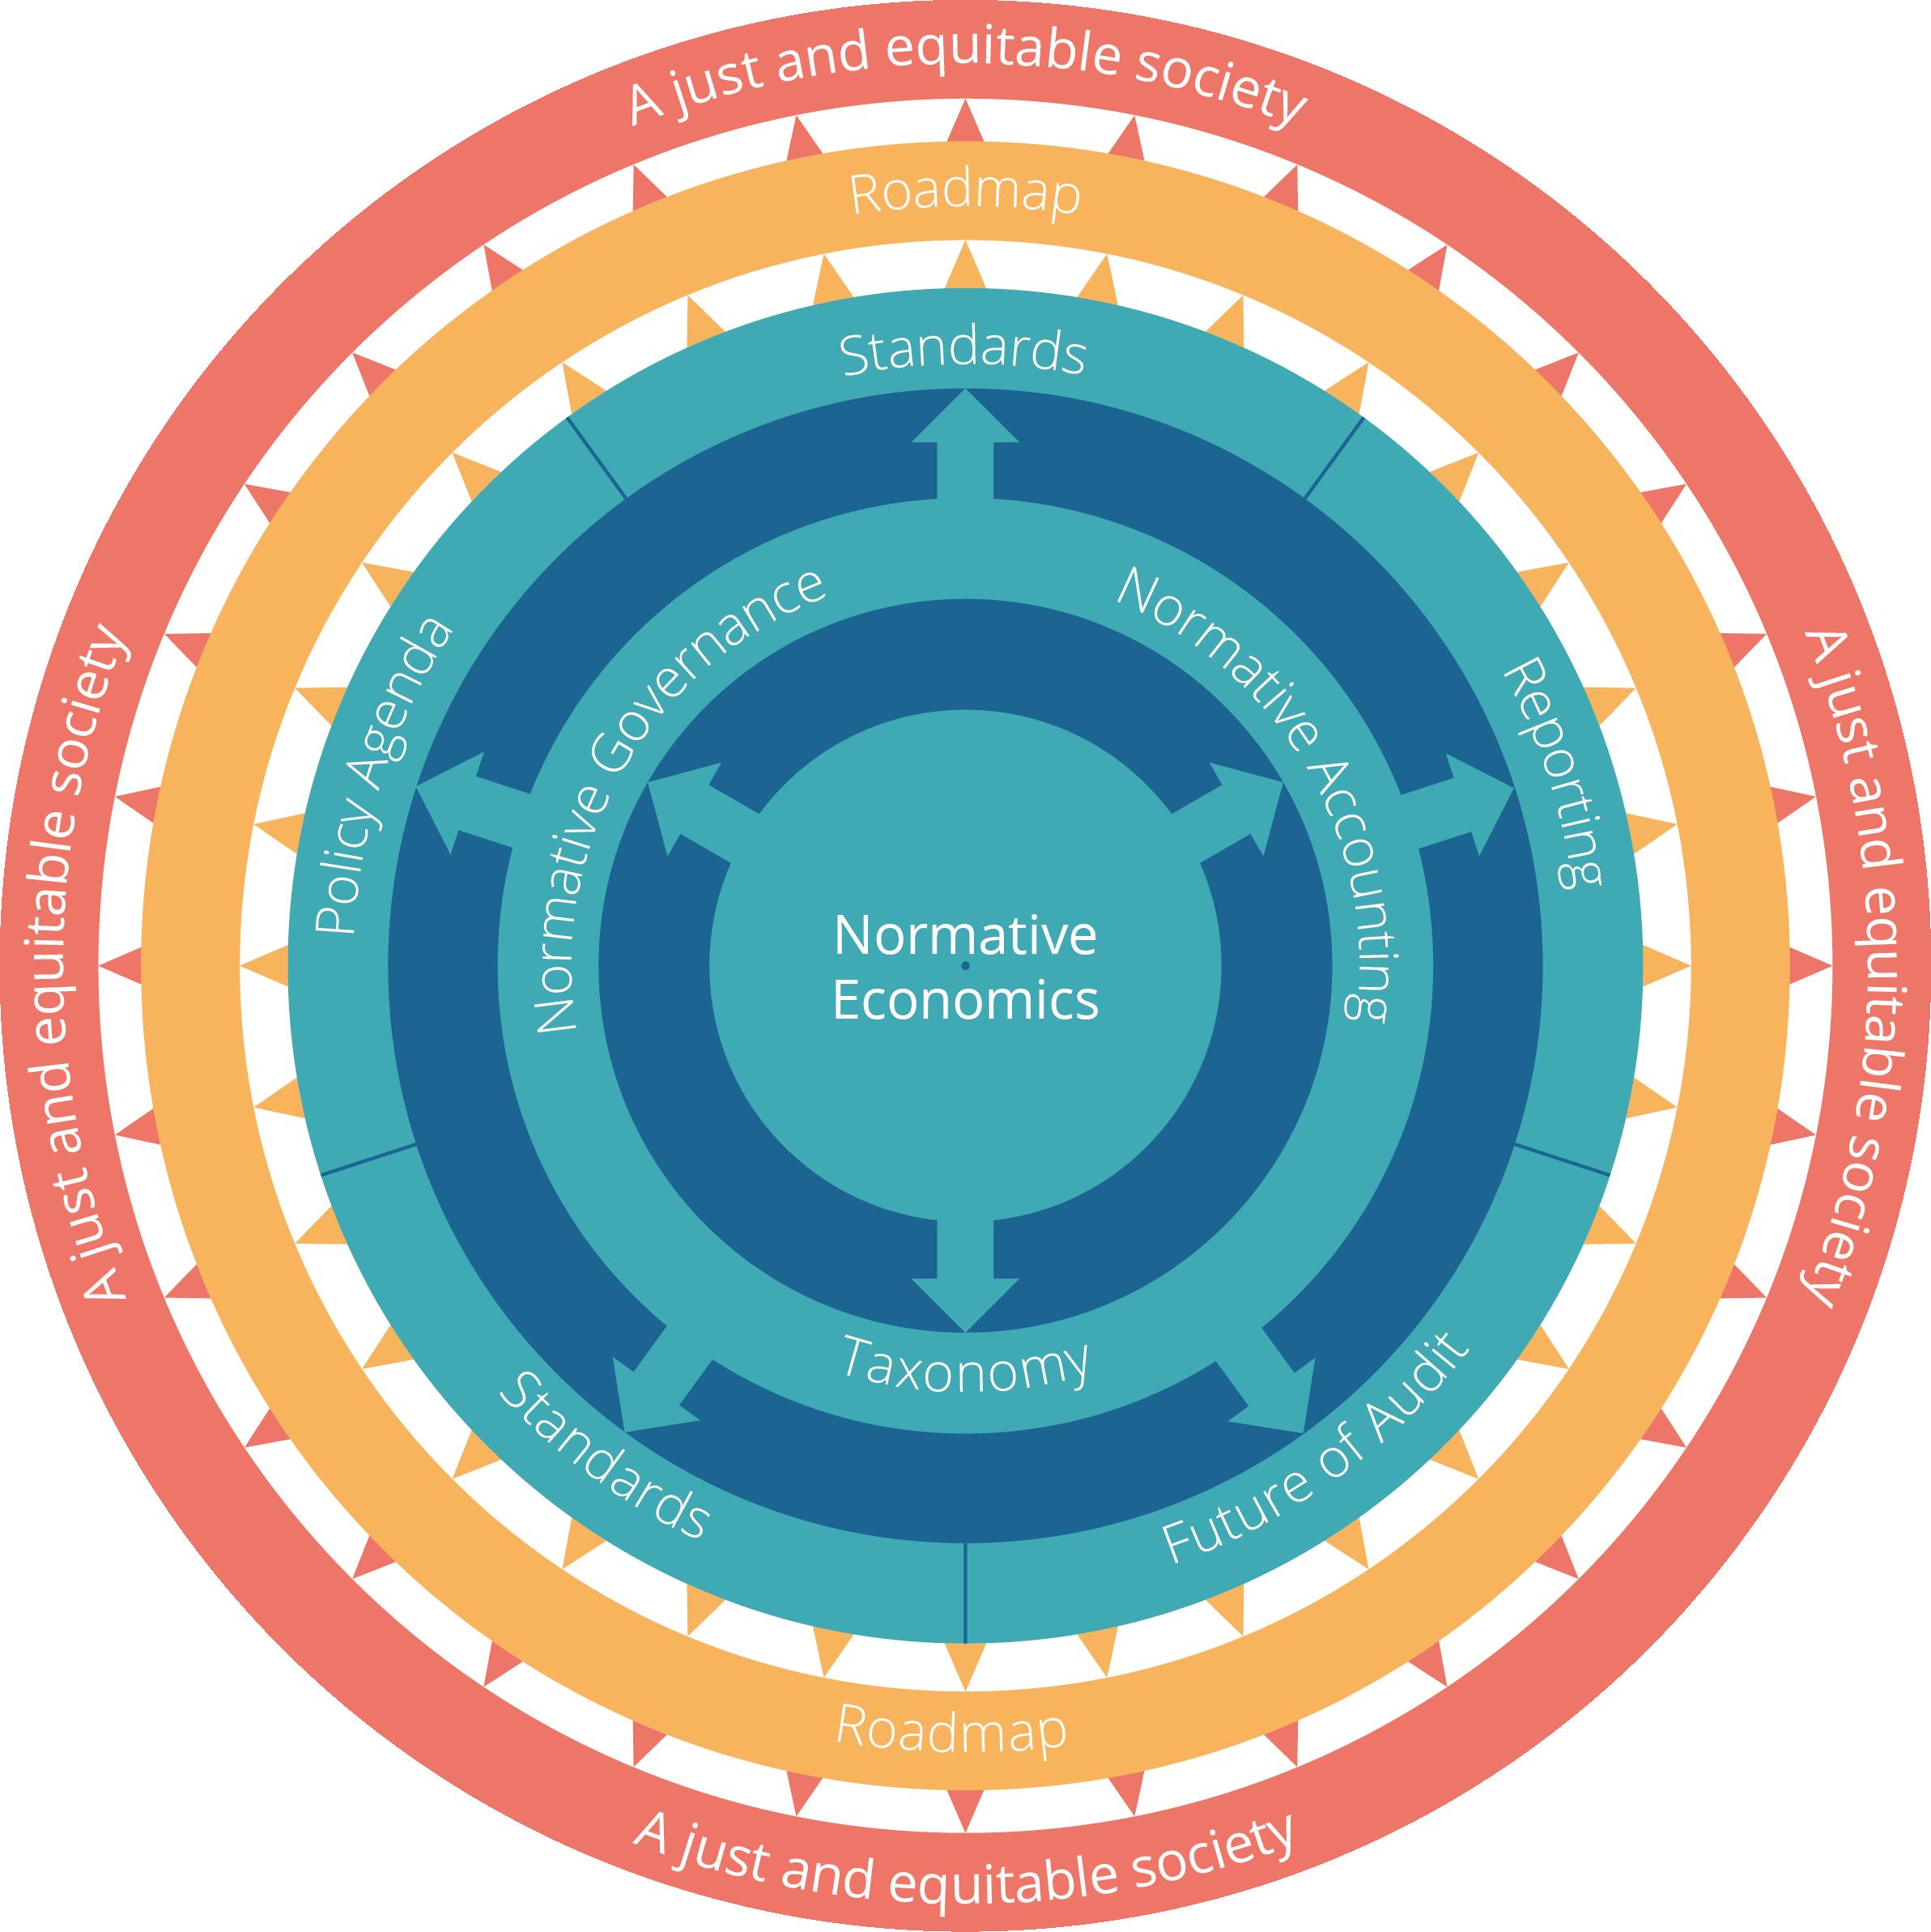 Rethinking Capital's Normative Economics programme model